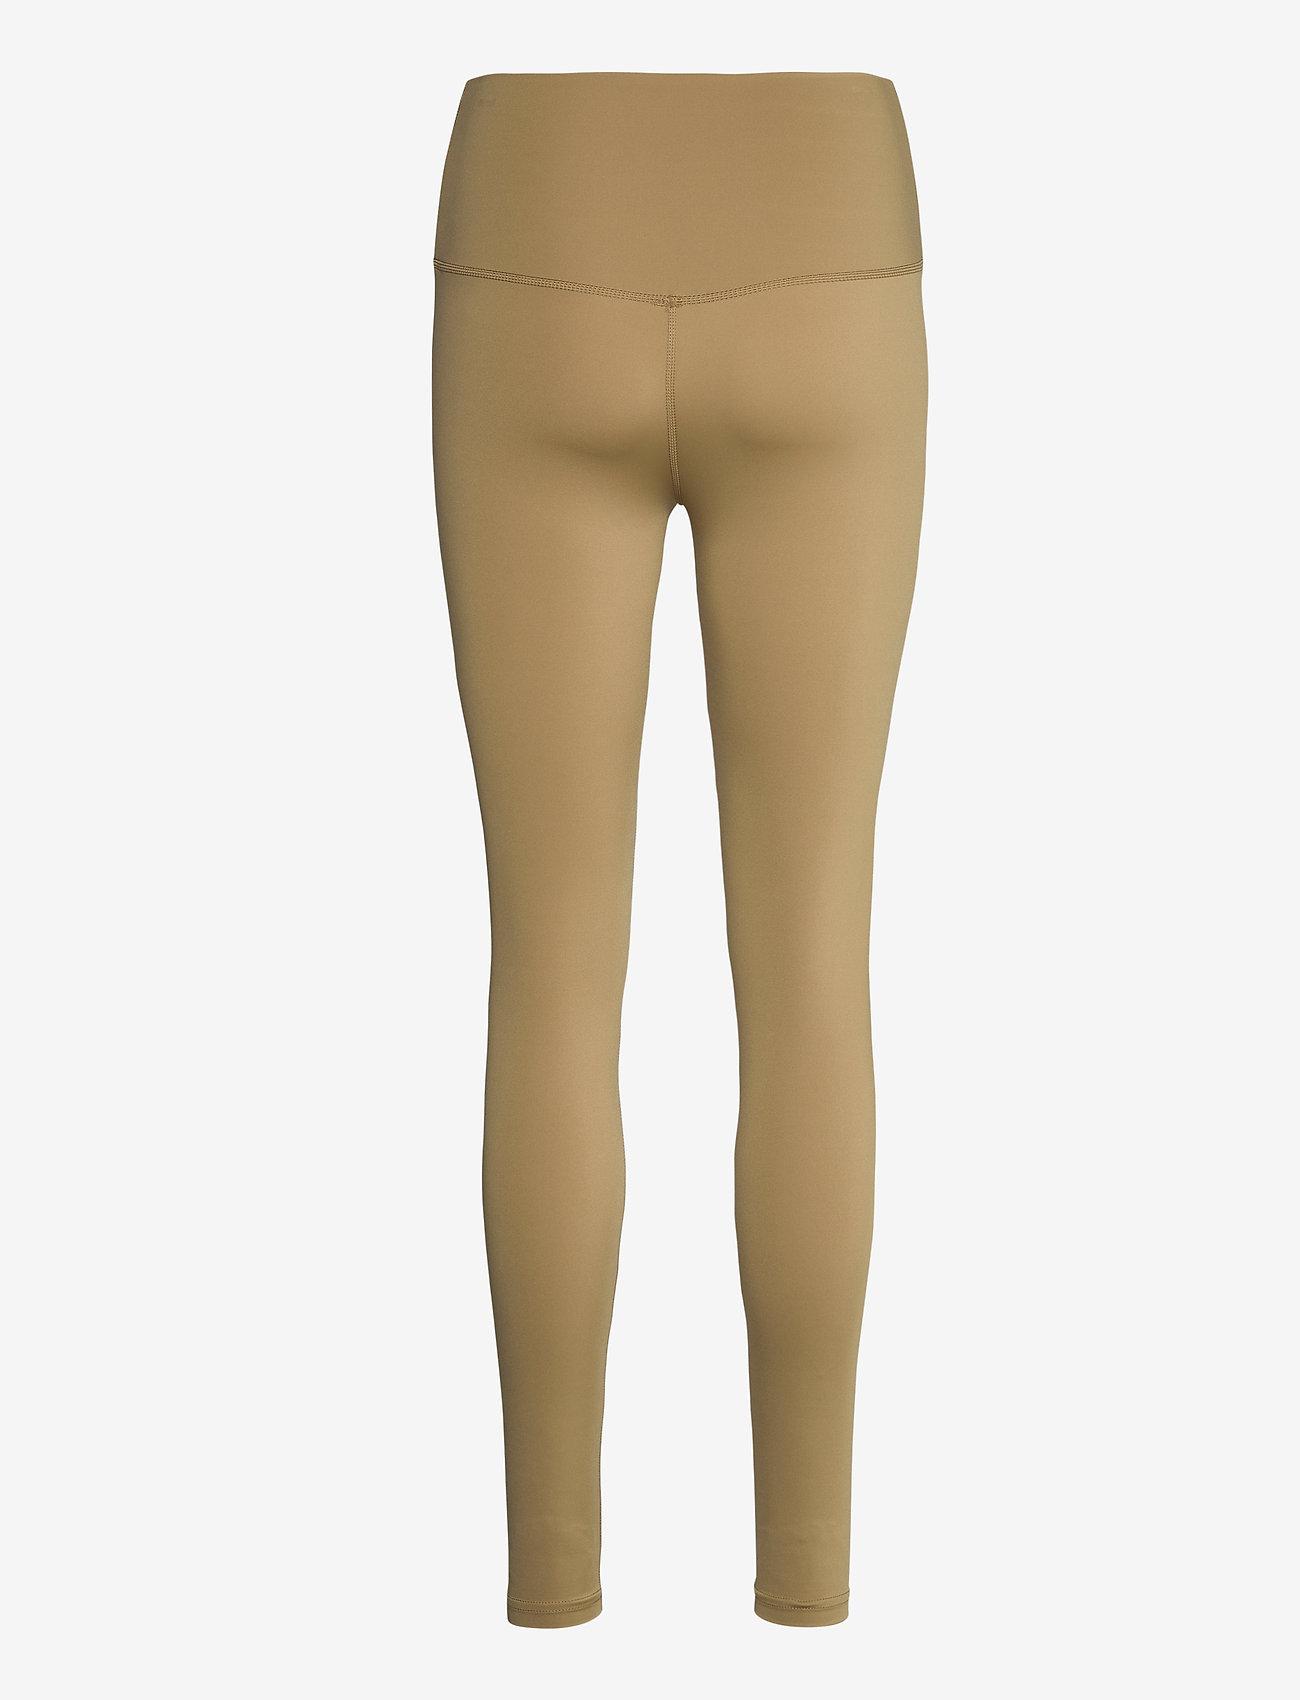 HALO - HALO WOMENS HIGHRISE TIGHTS - tights & shorts - kelp - 1